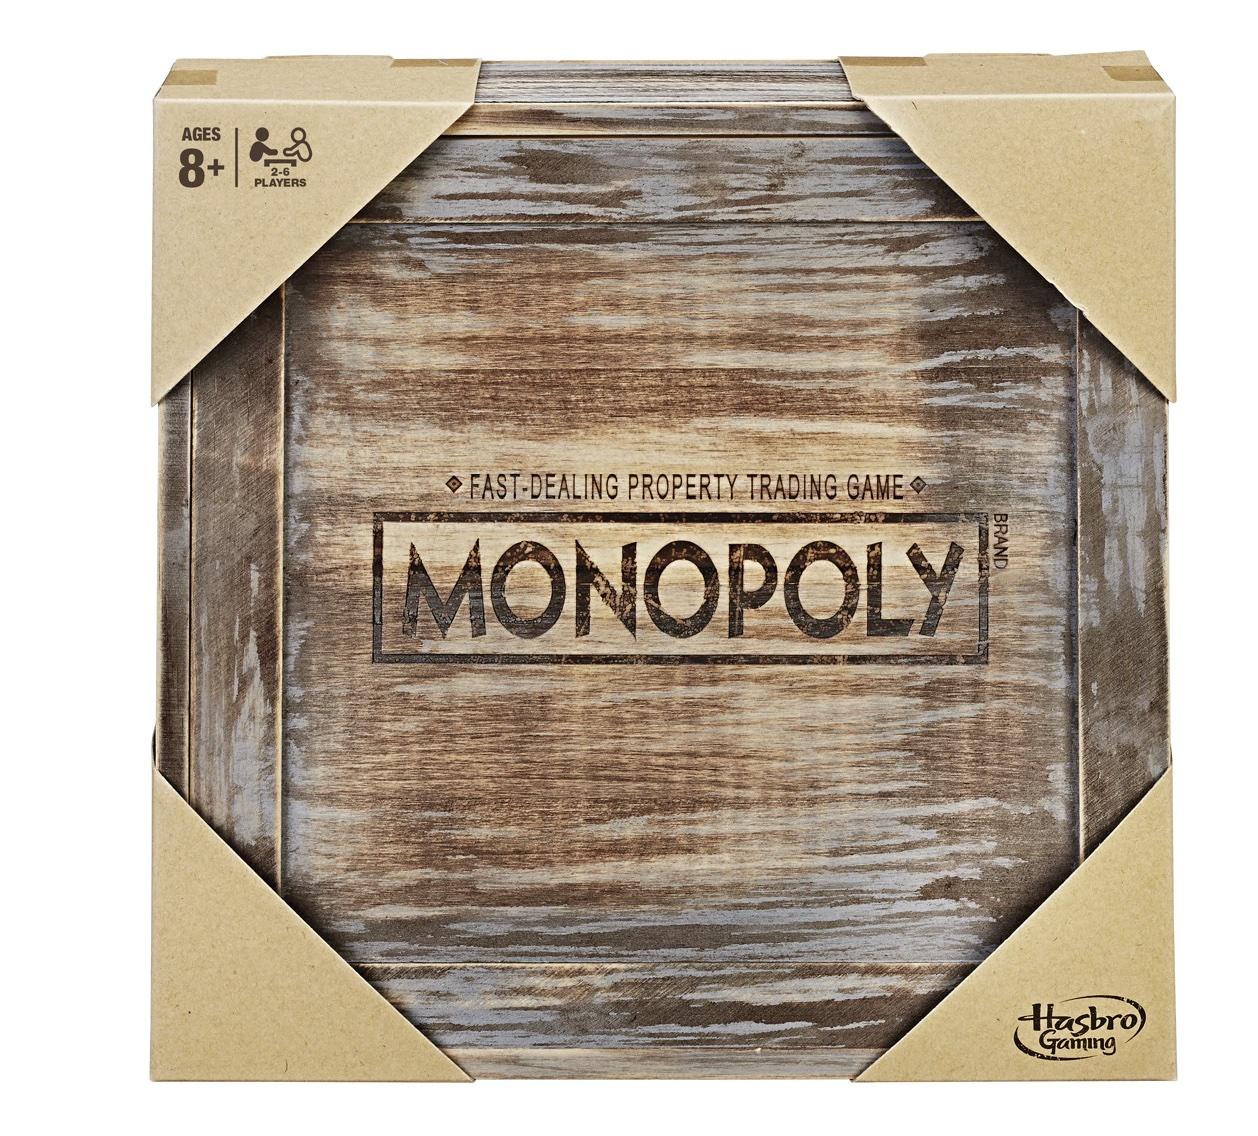 HASBRO Monopoly Rustic